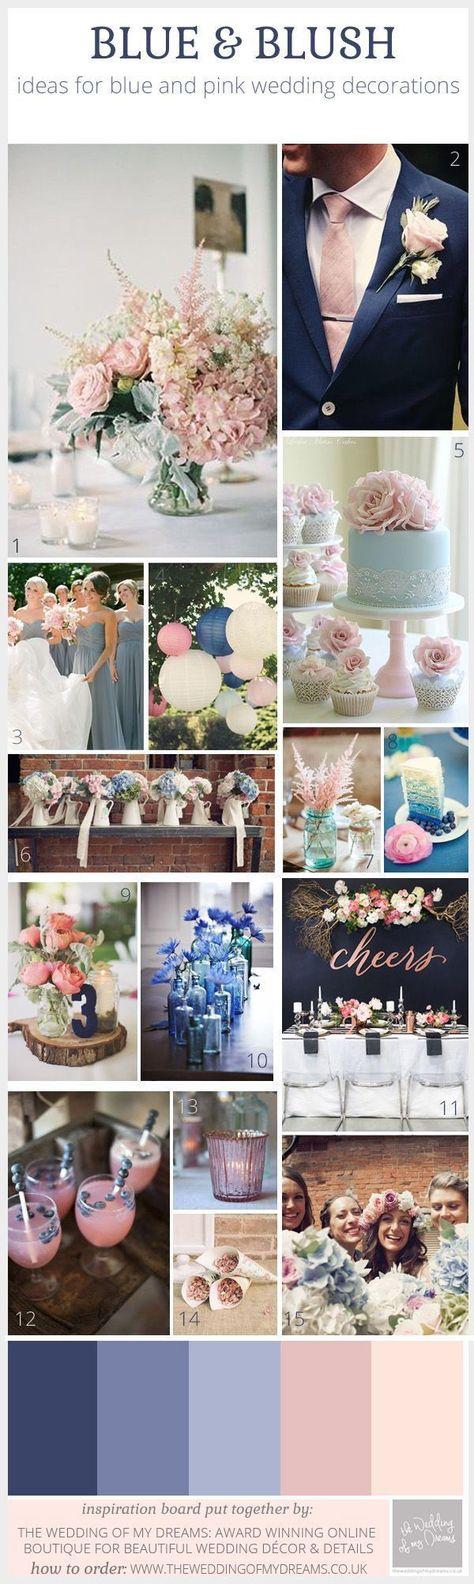 Blue And Blush Pink Wedding Decorations, 2016 wedding colors, blush wedding ideas. #countryweddings